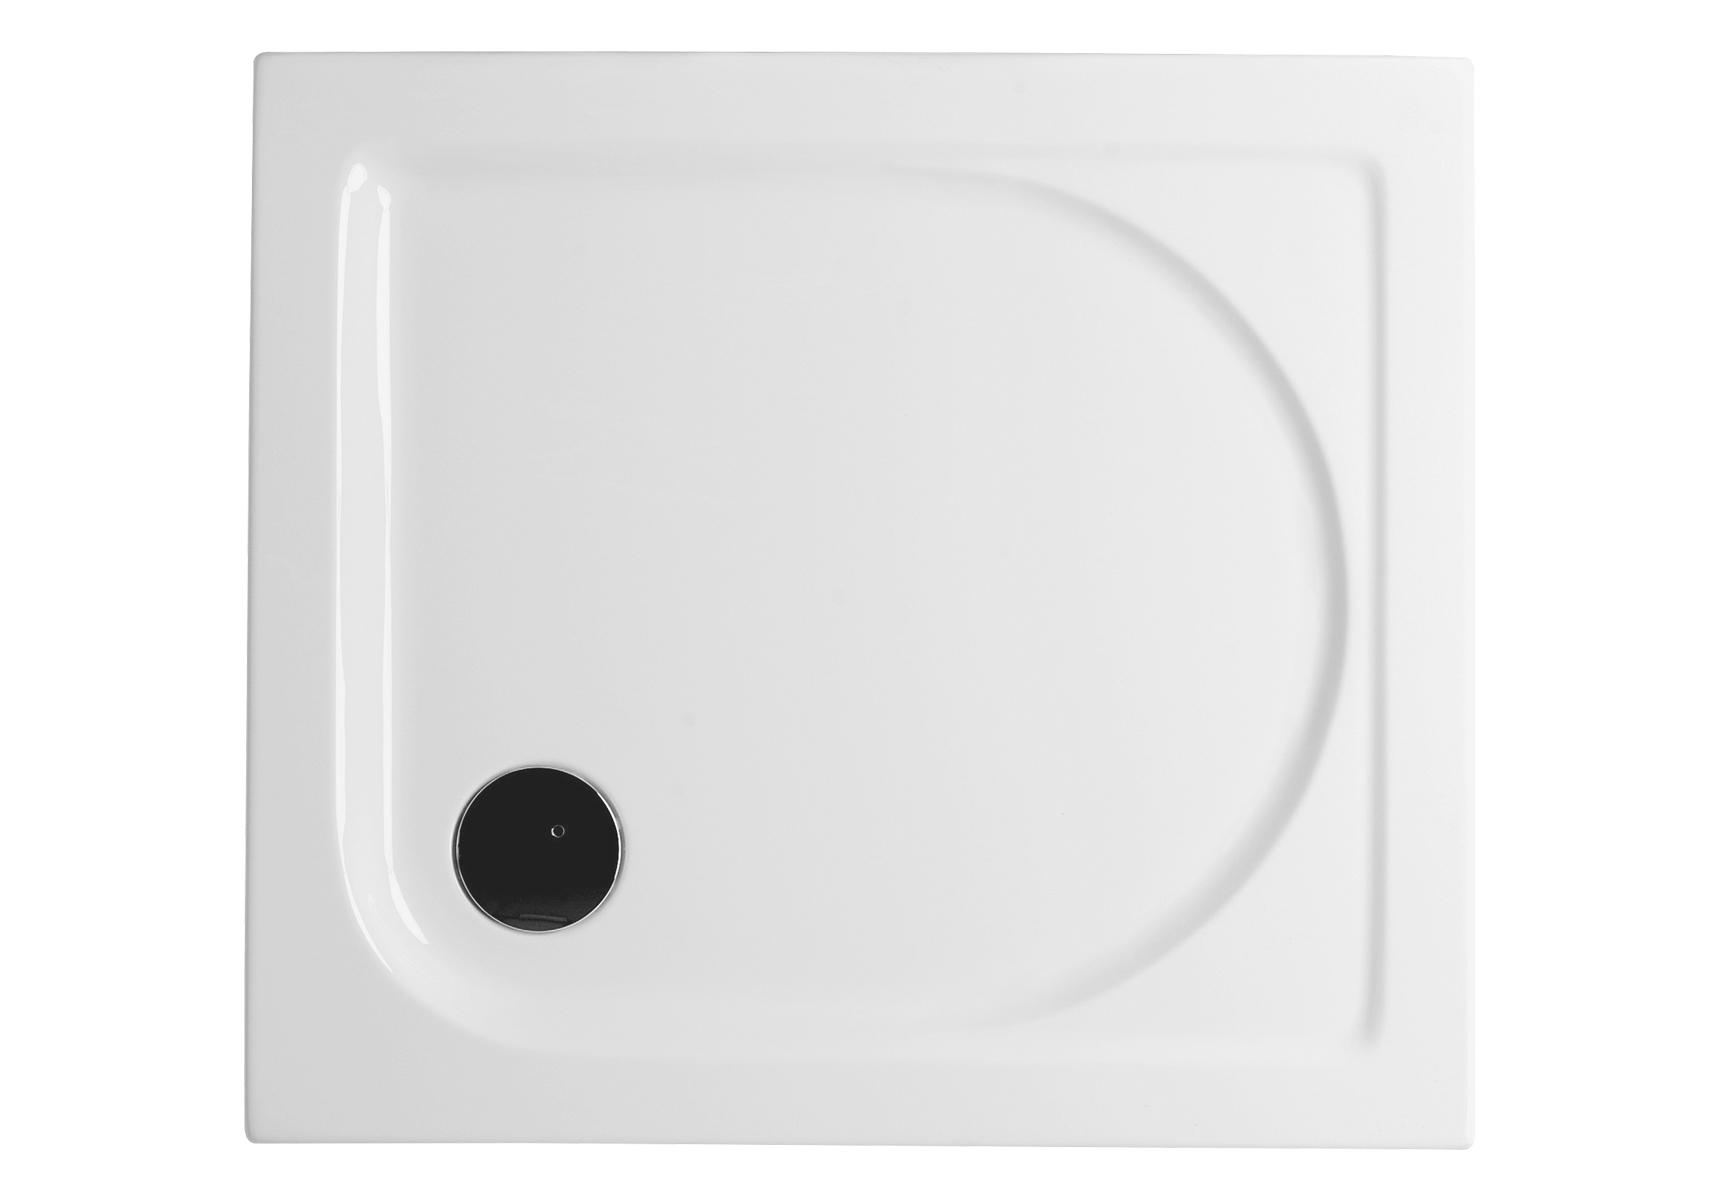 Integra receveur ultra plat en acrylique, carré, 100  x  100 cm